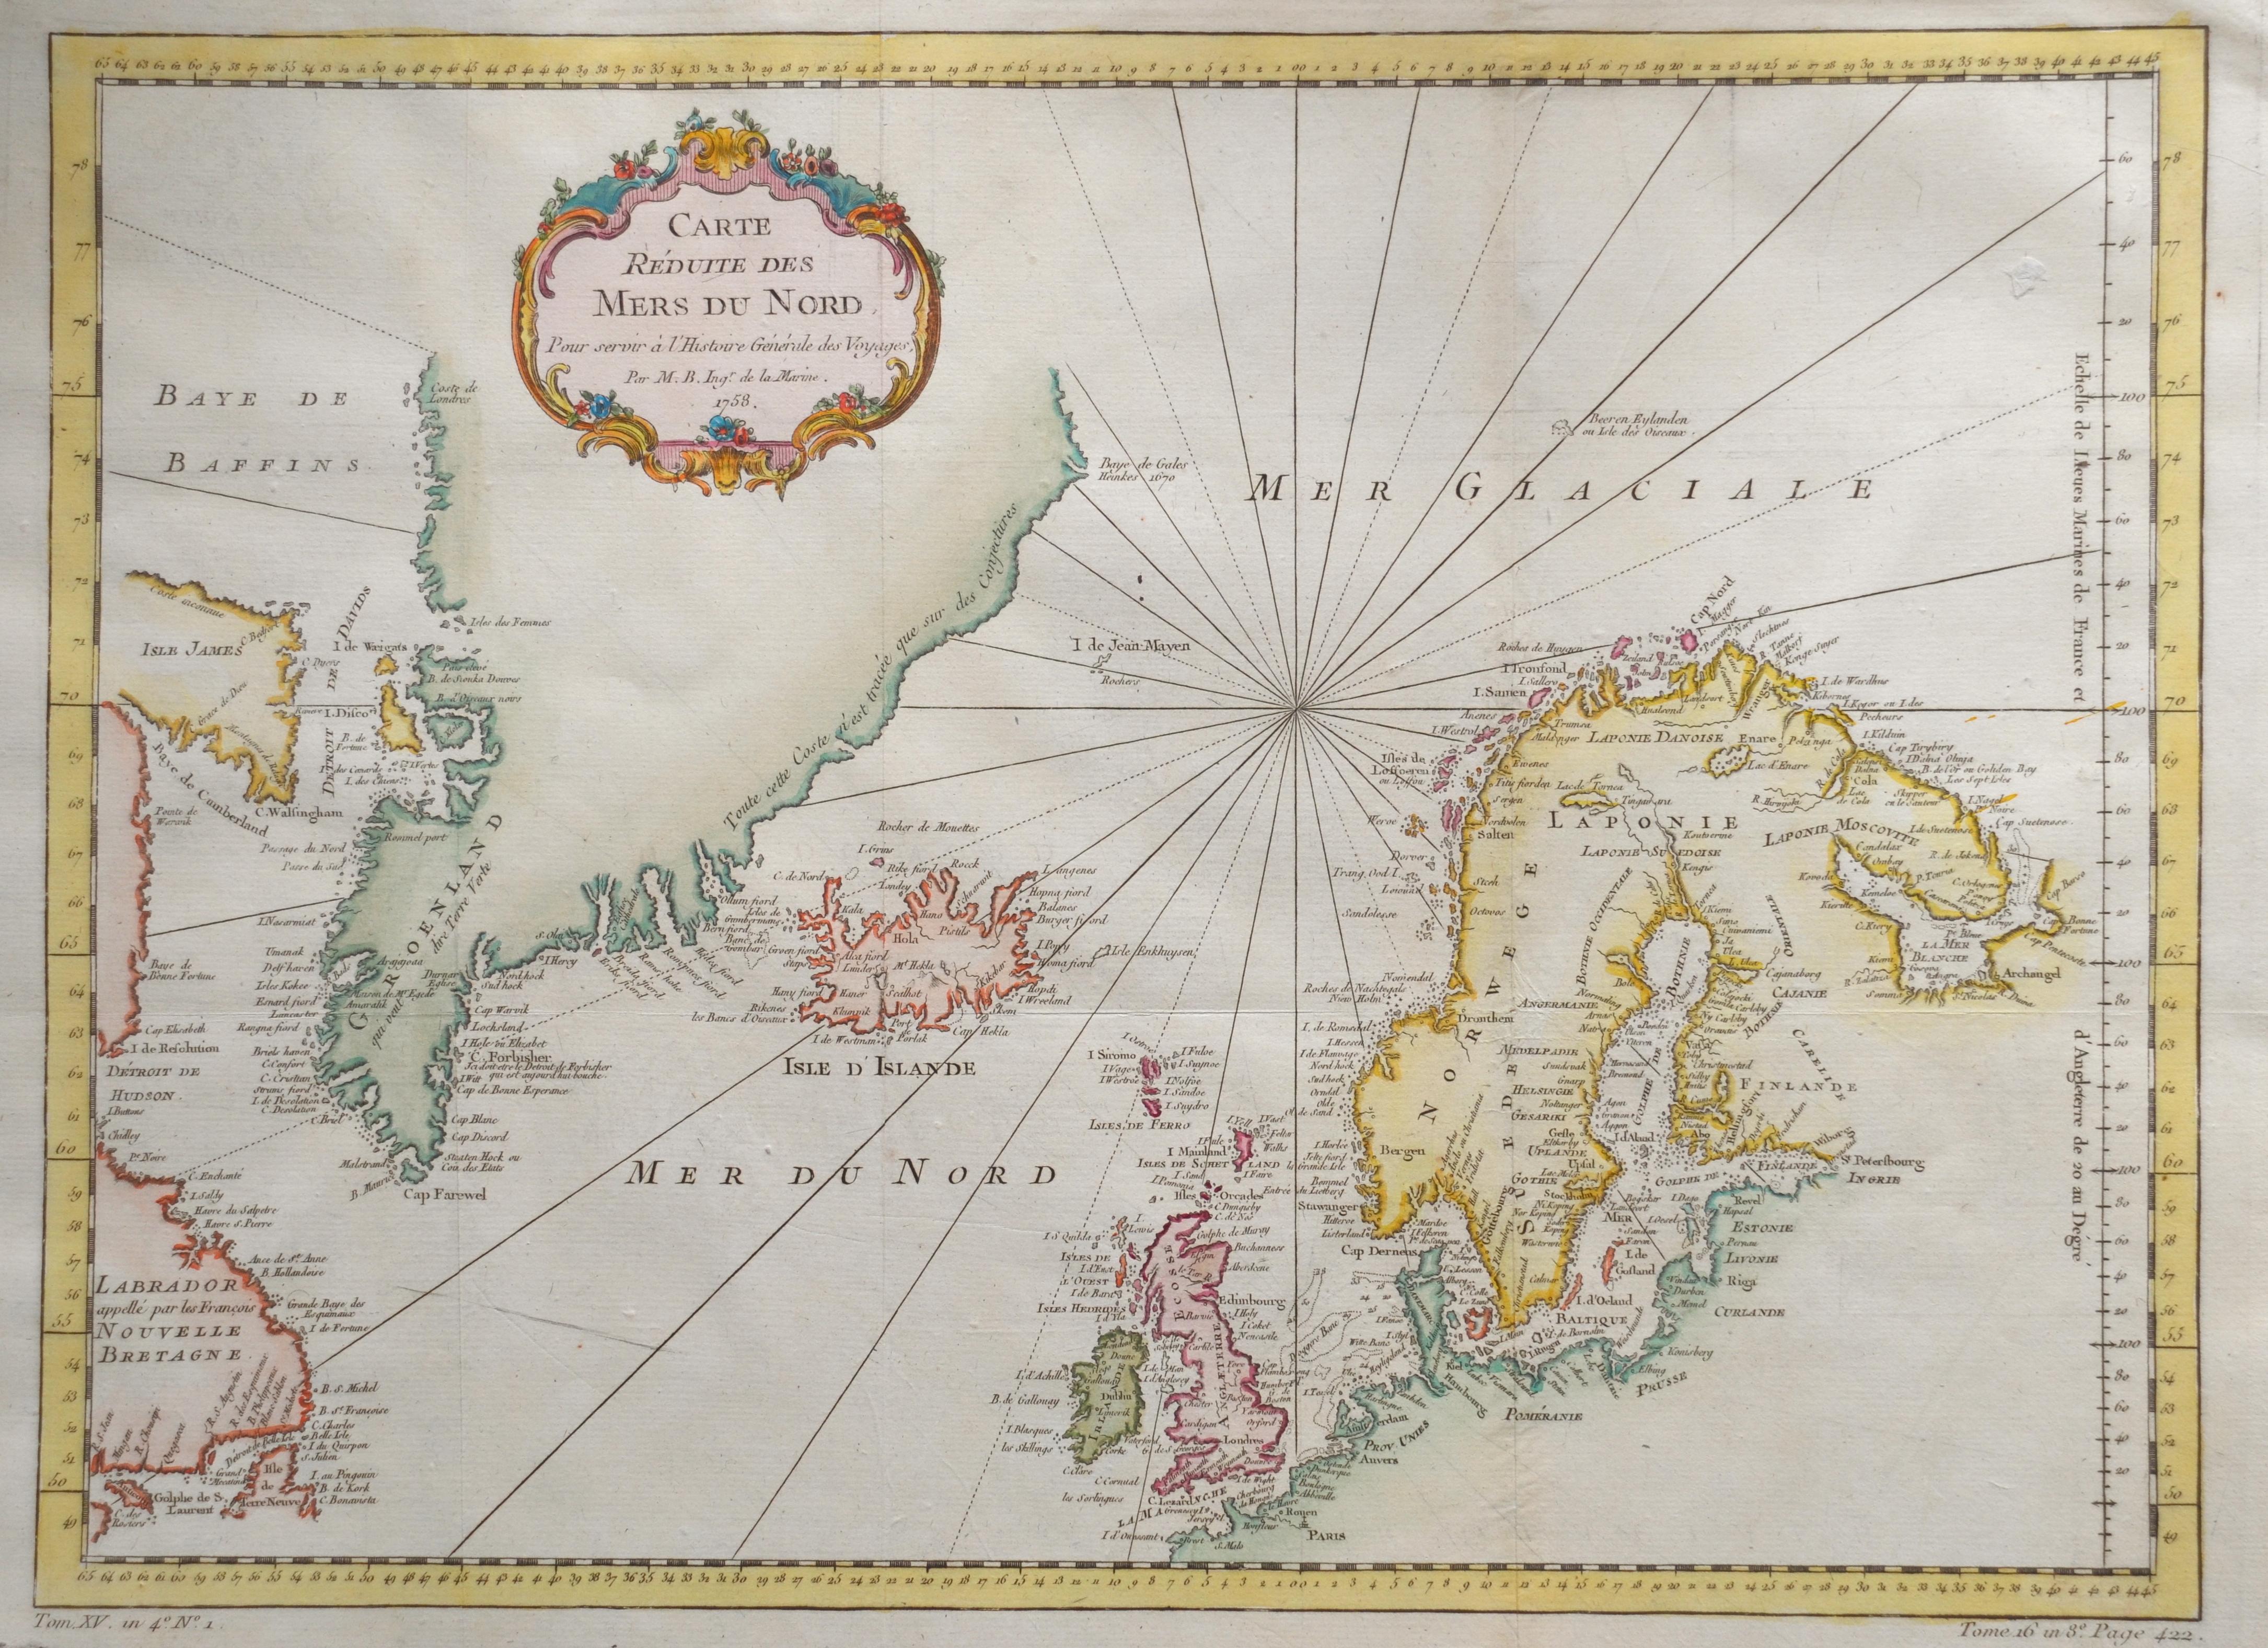 Bellin  Carte reduite des mers du nord